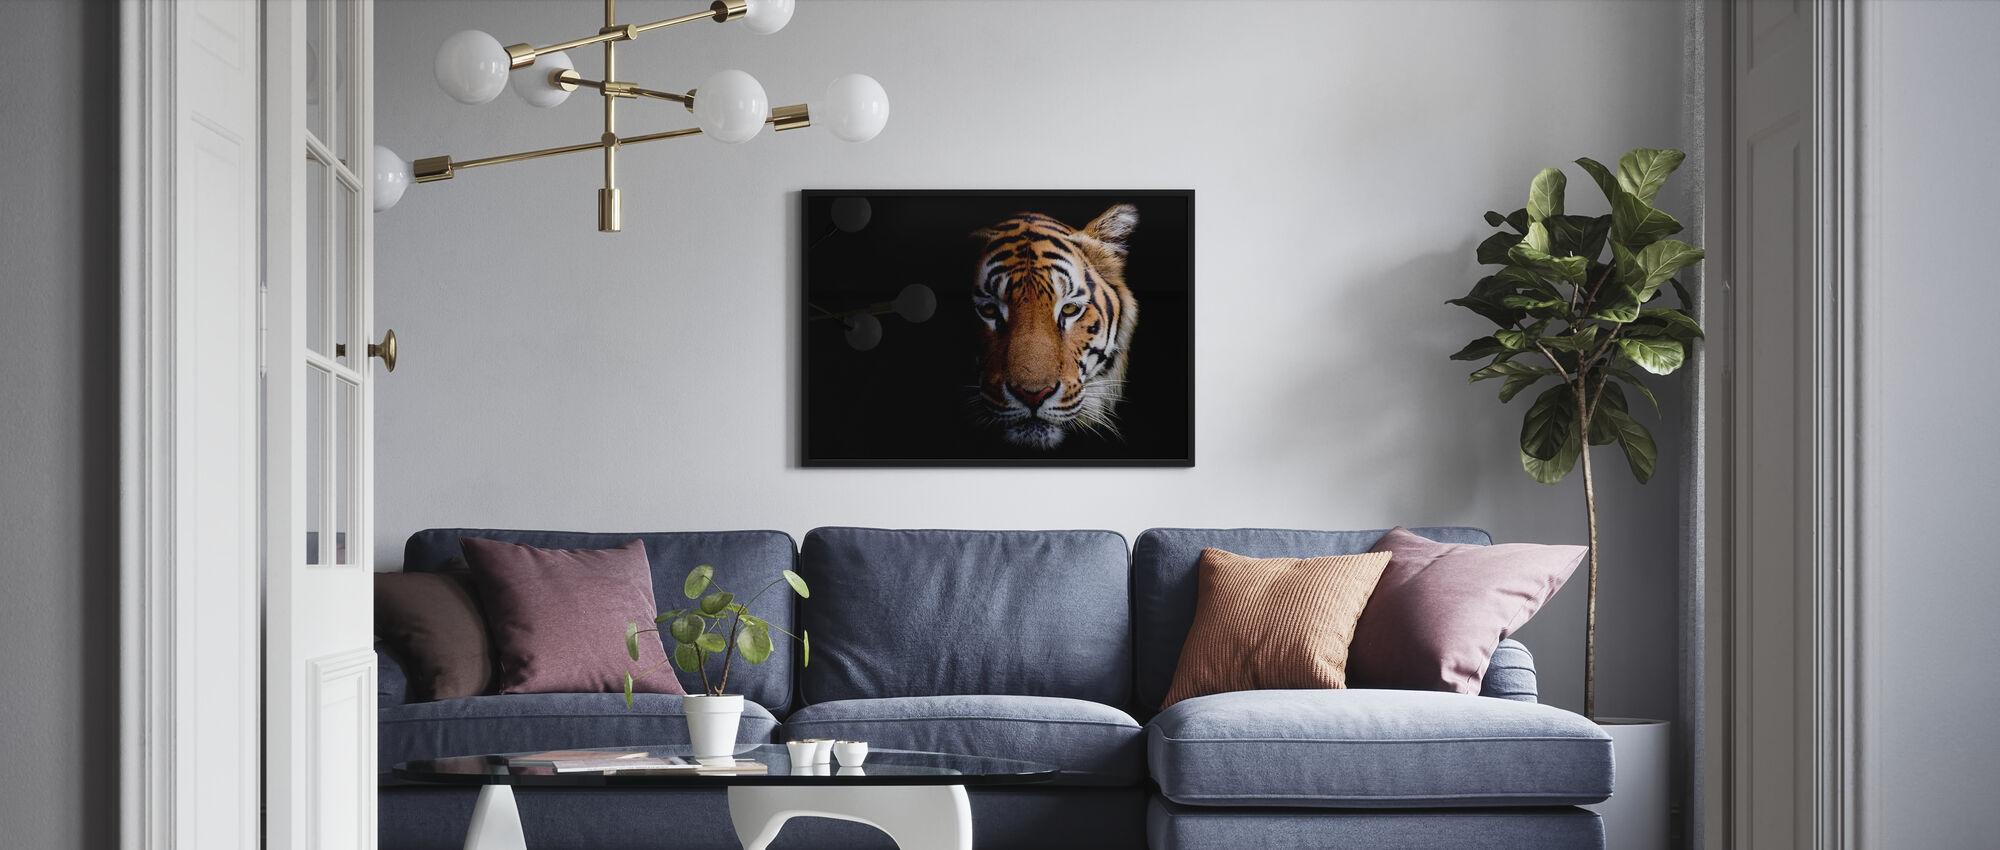 Tiger - Plakat - Stue